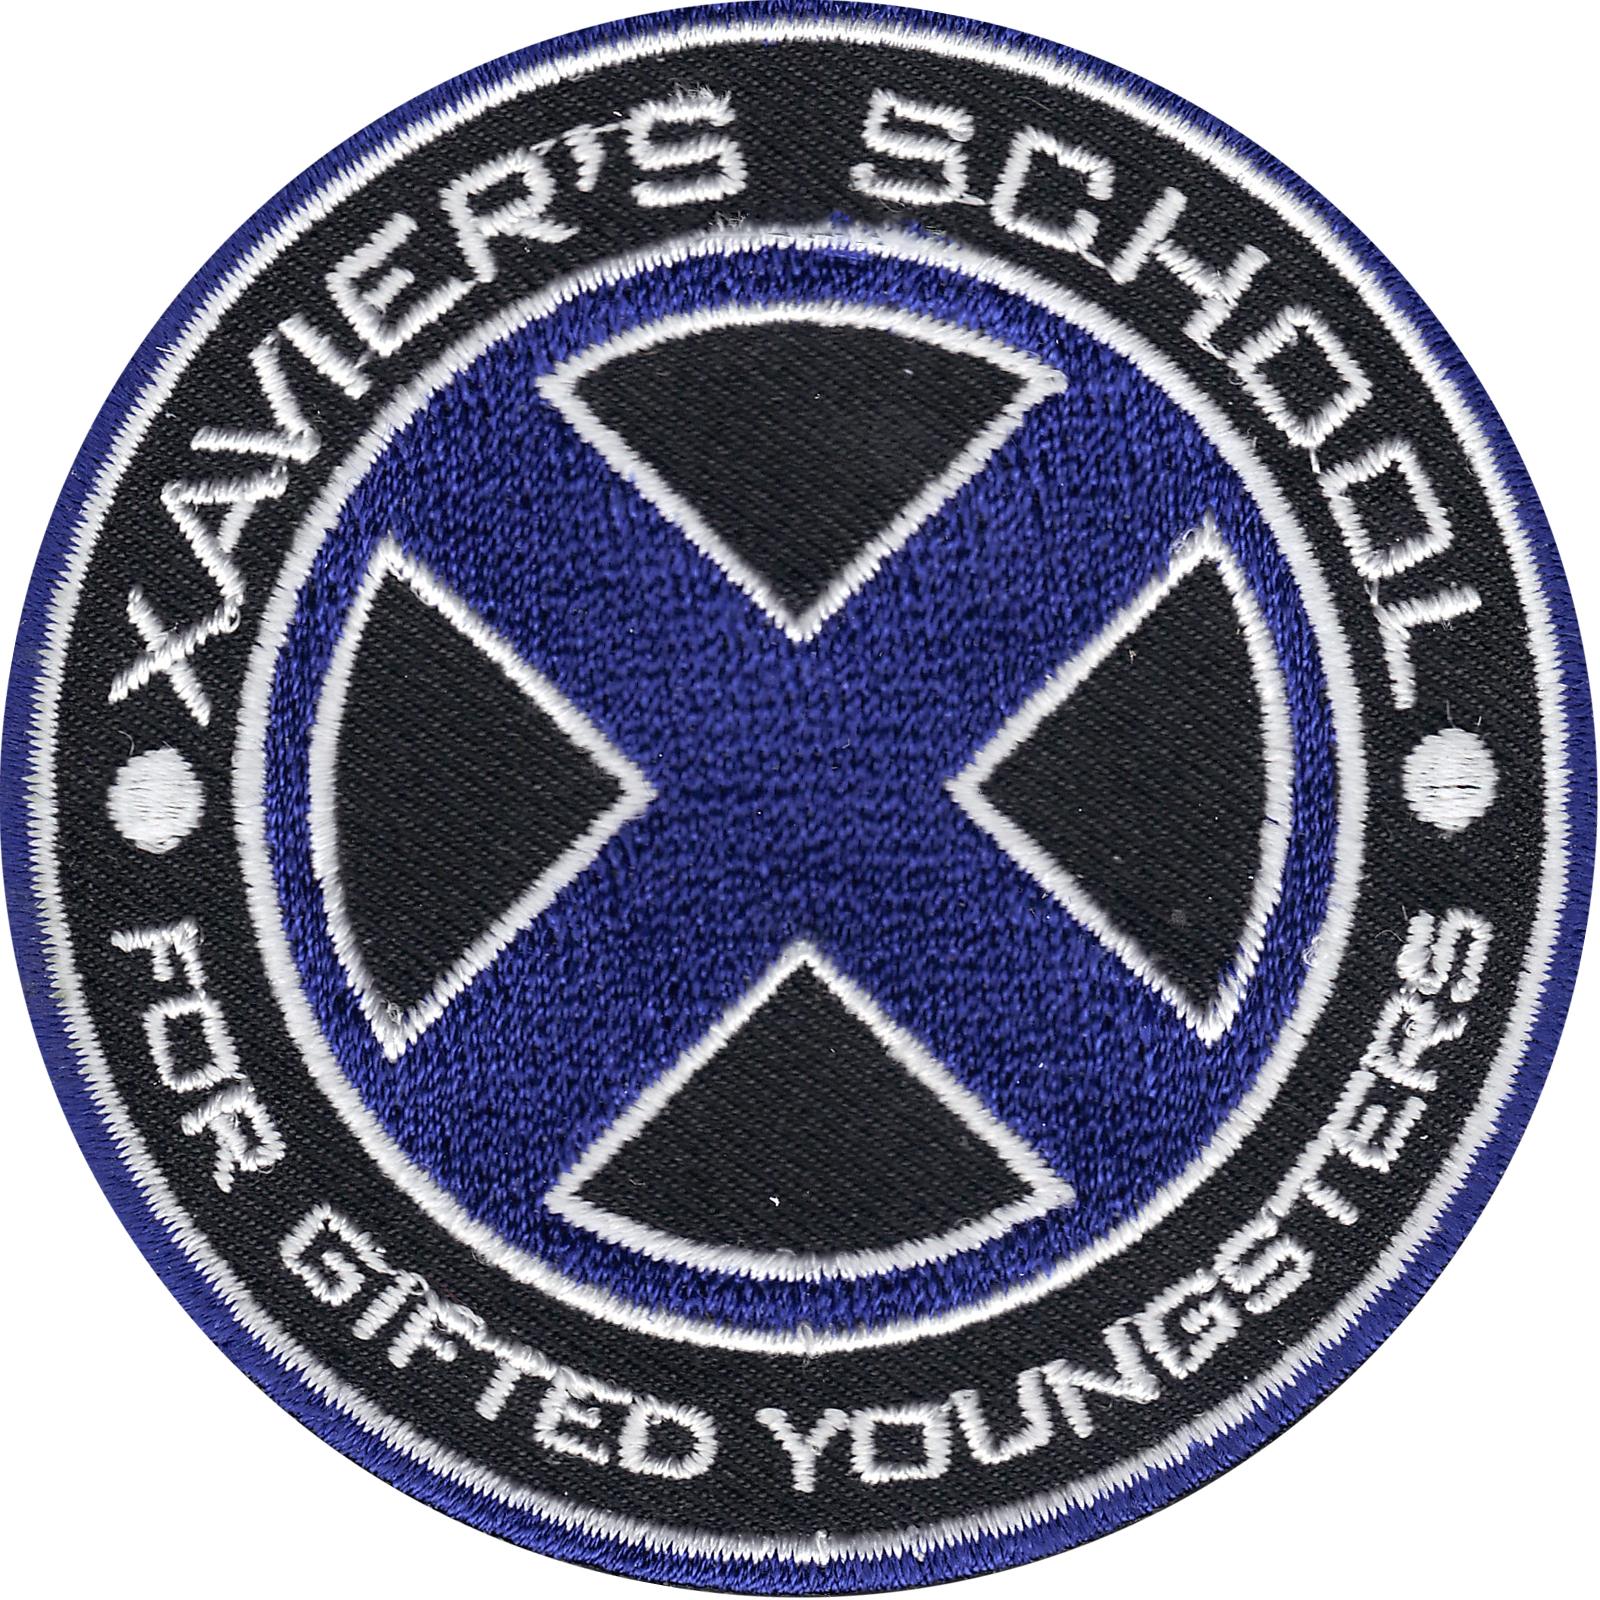 Marvel X-Men Xavier's School Logo Iron on Patch